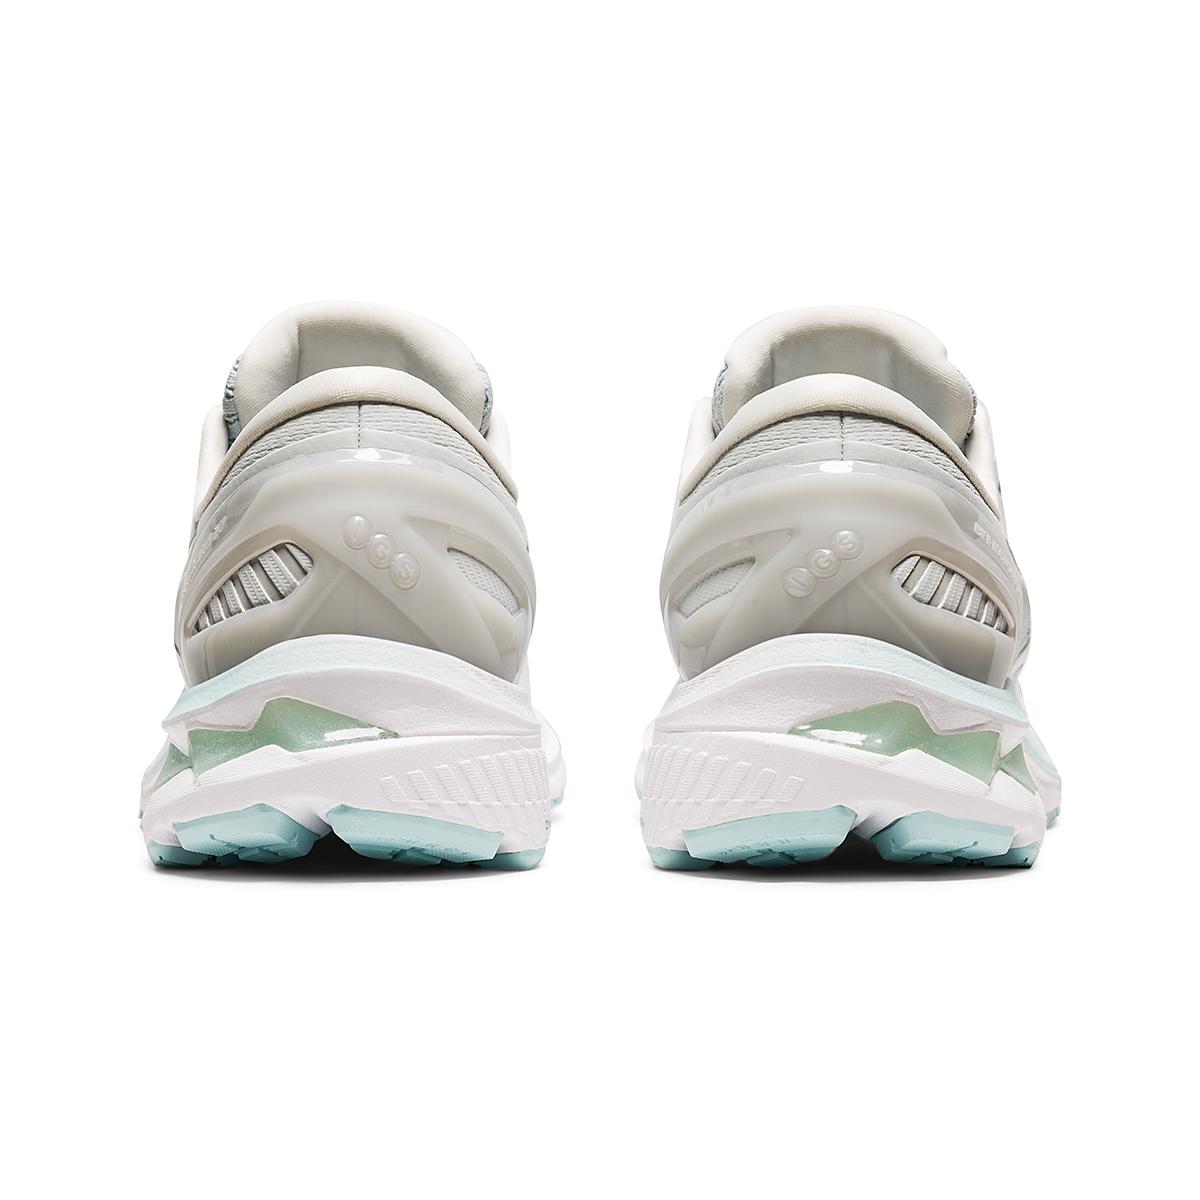 Women's Asics GEL-Kayano 27 Running Shoe - Color: Glacier Grey/White - Size: 6 - Width: Regular, Glacier Grey/White, large, image 6